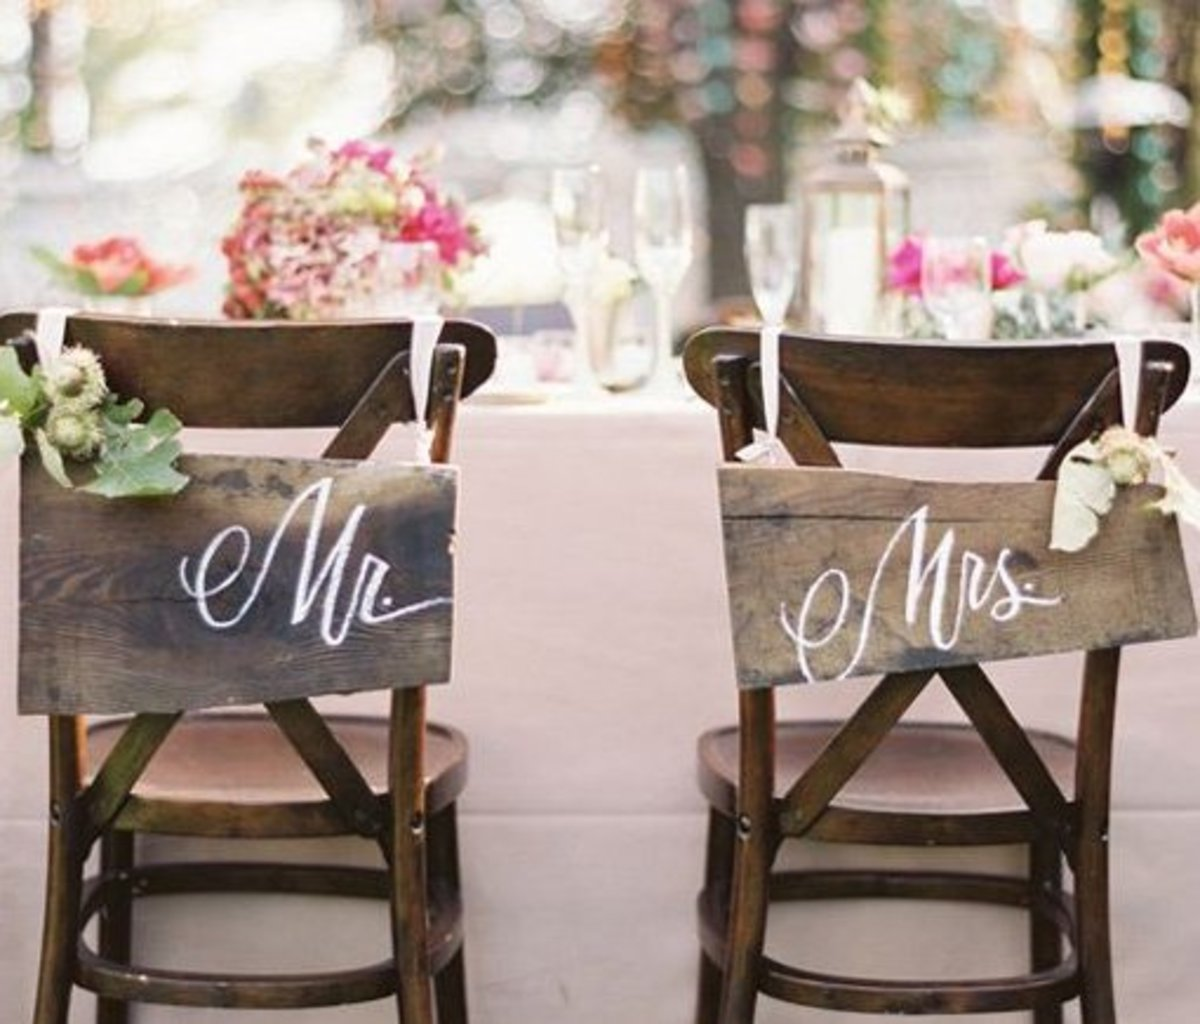 DIY Wedding Table Decoration Ideas   Bride n Groom Wedding Chairs   Click Pic for 20 Easy DIY Wedding Decorations